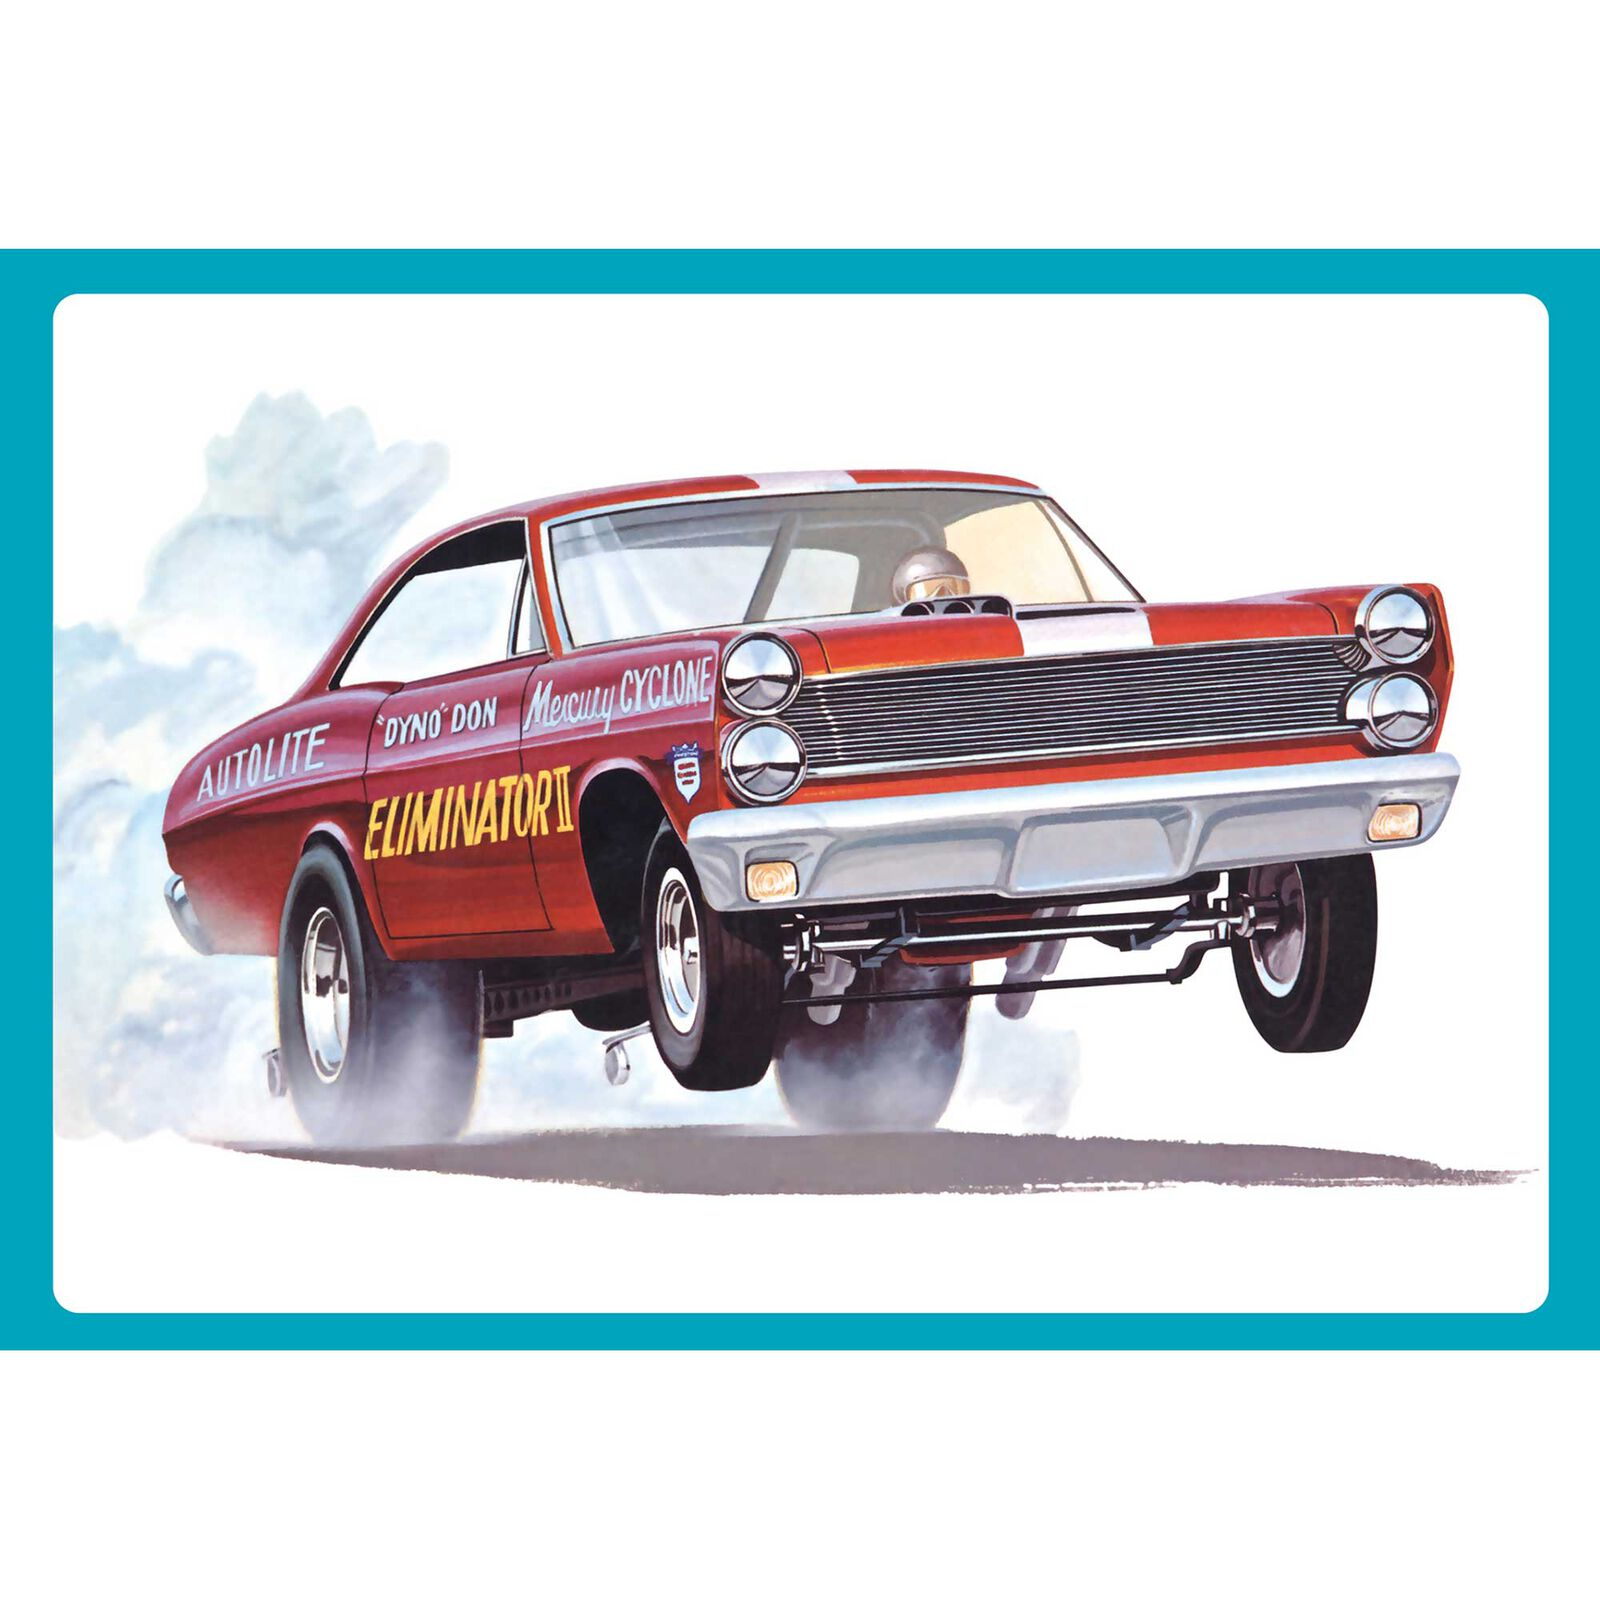 1/25 1967 Mercury Cyclone Eliminator II Dyno Don